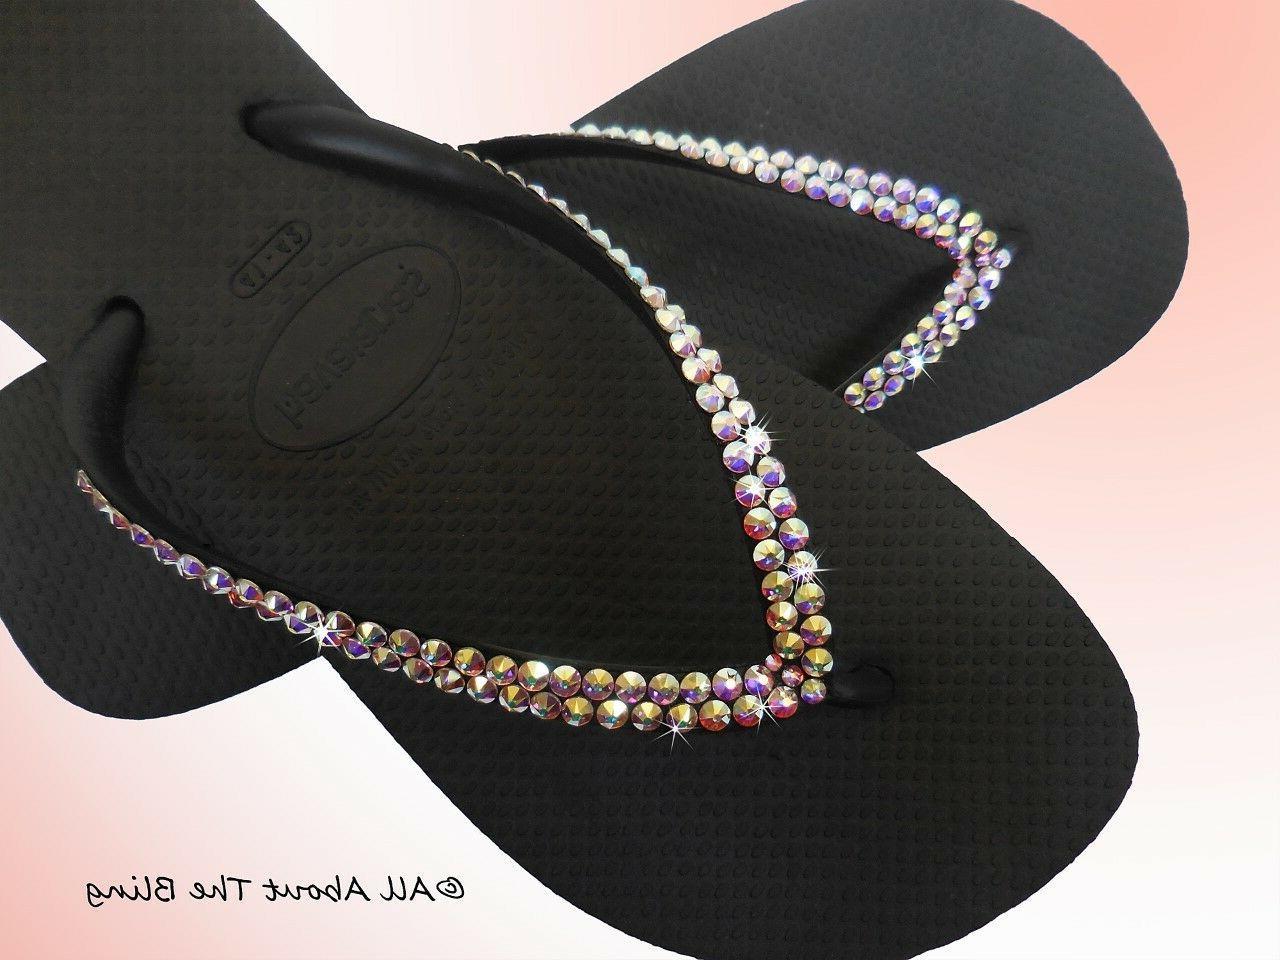 Havaianas strap with Swarovski rhinestone iridescent